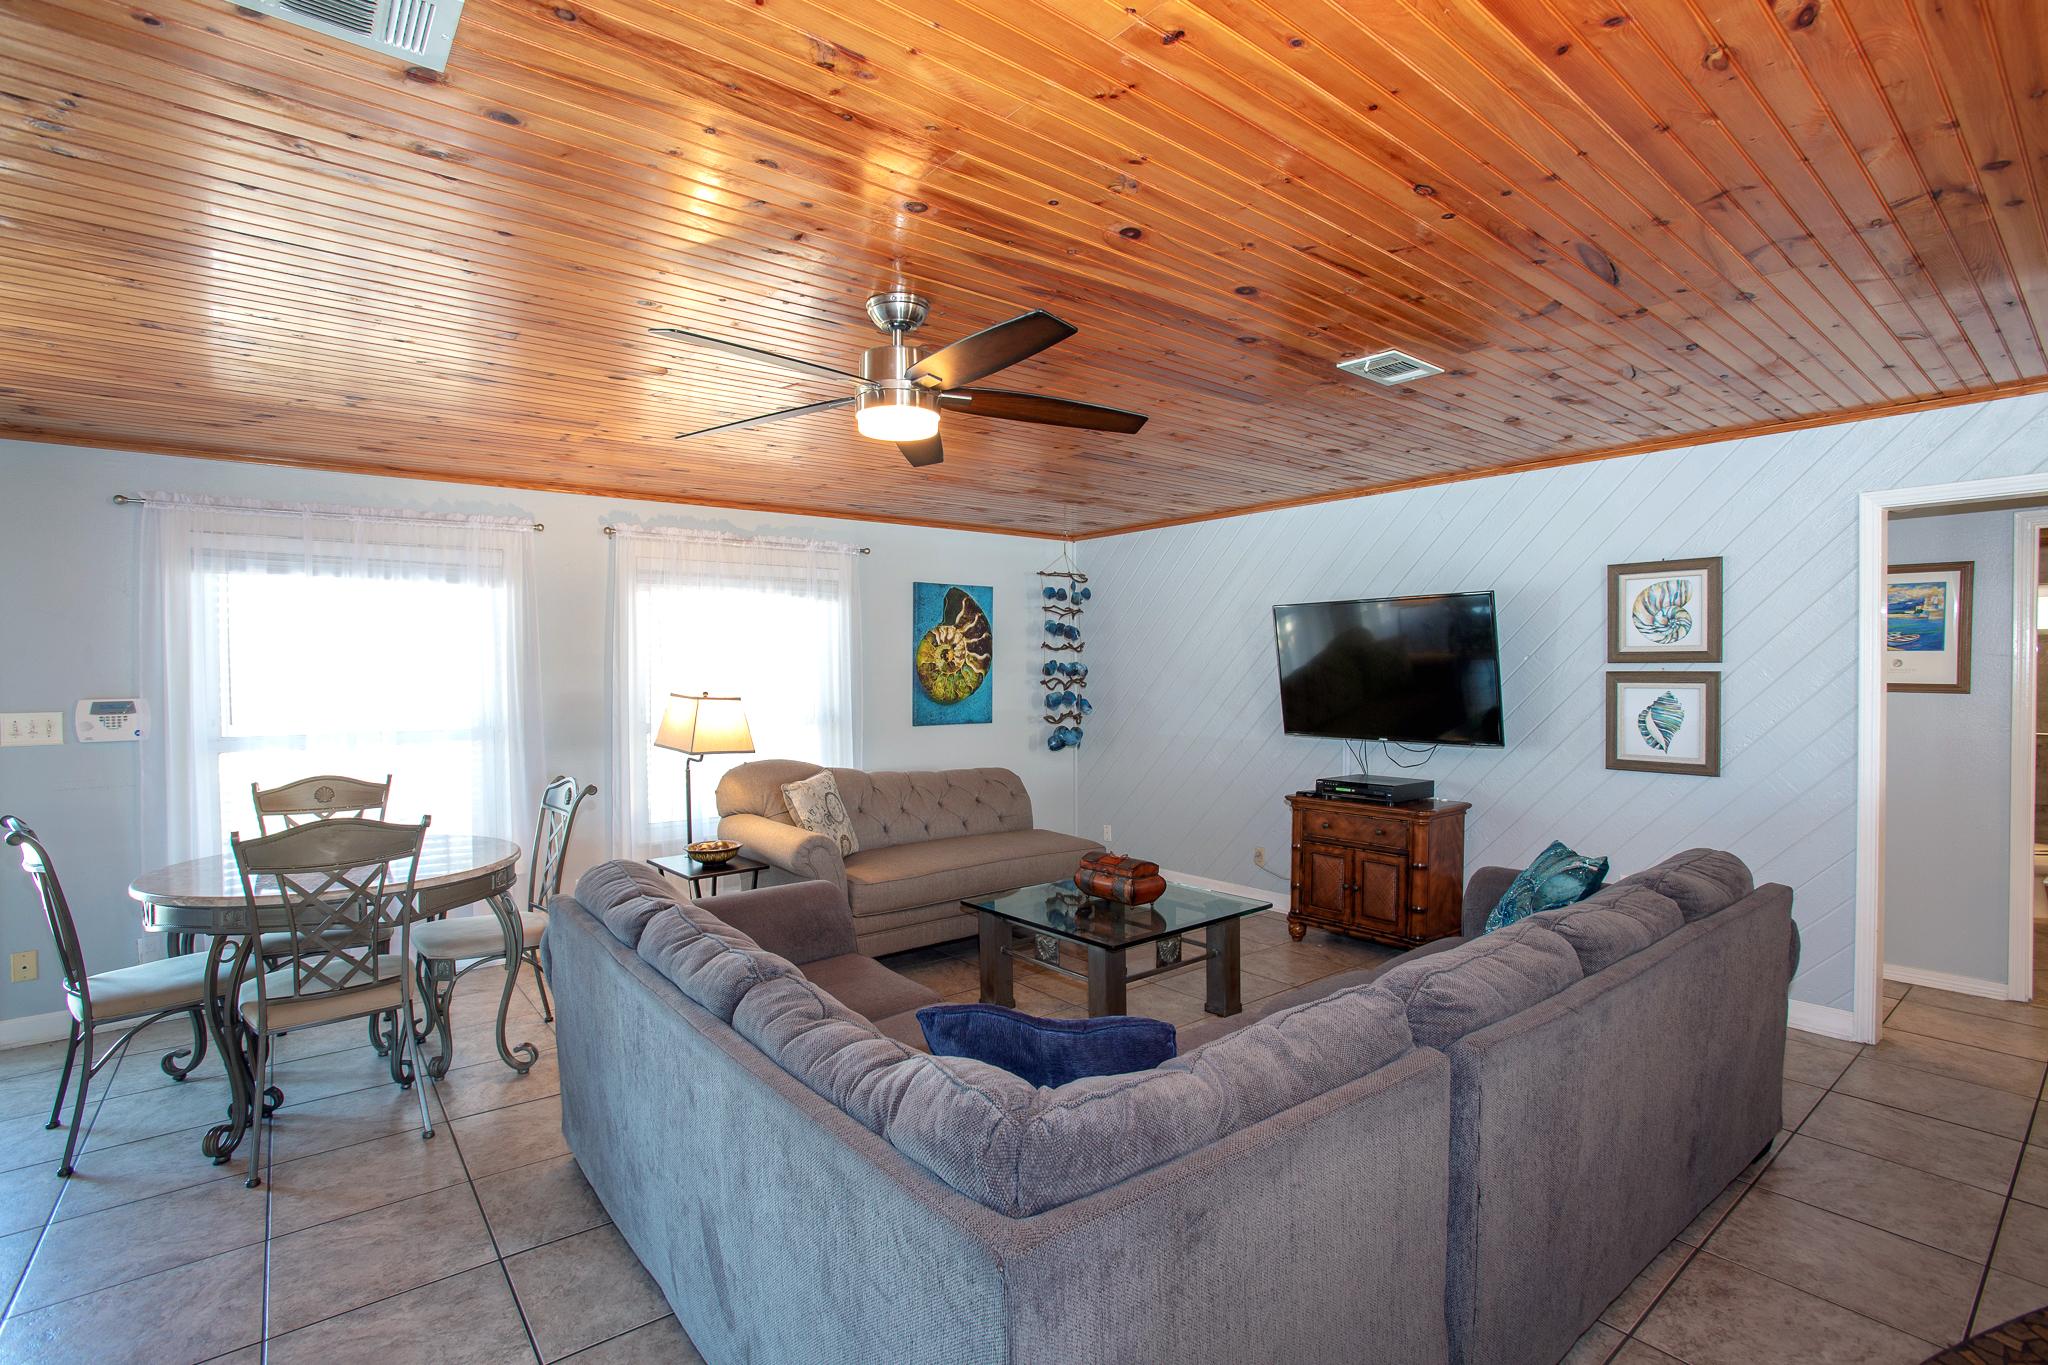 Maldonado 1015 - Sea the Big Picture House/Cottage rental in Pensacola Beach House Rentals in Pensacola Beach Florida - #4